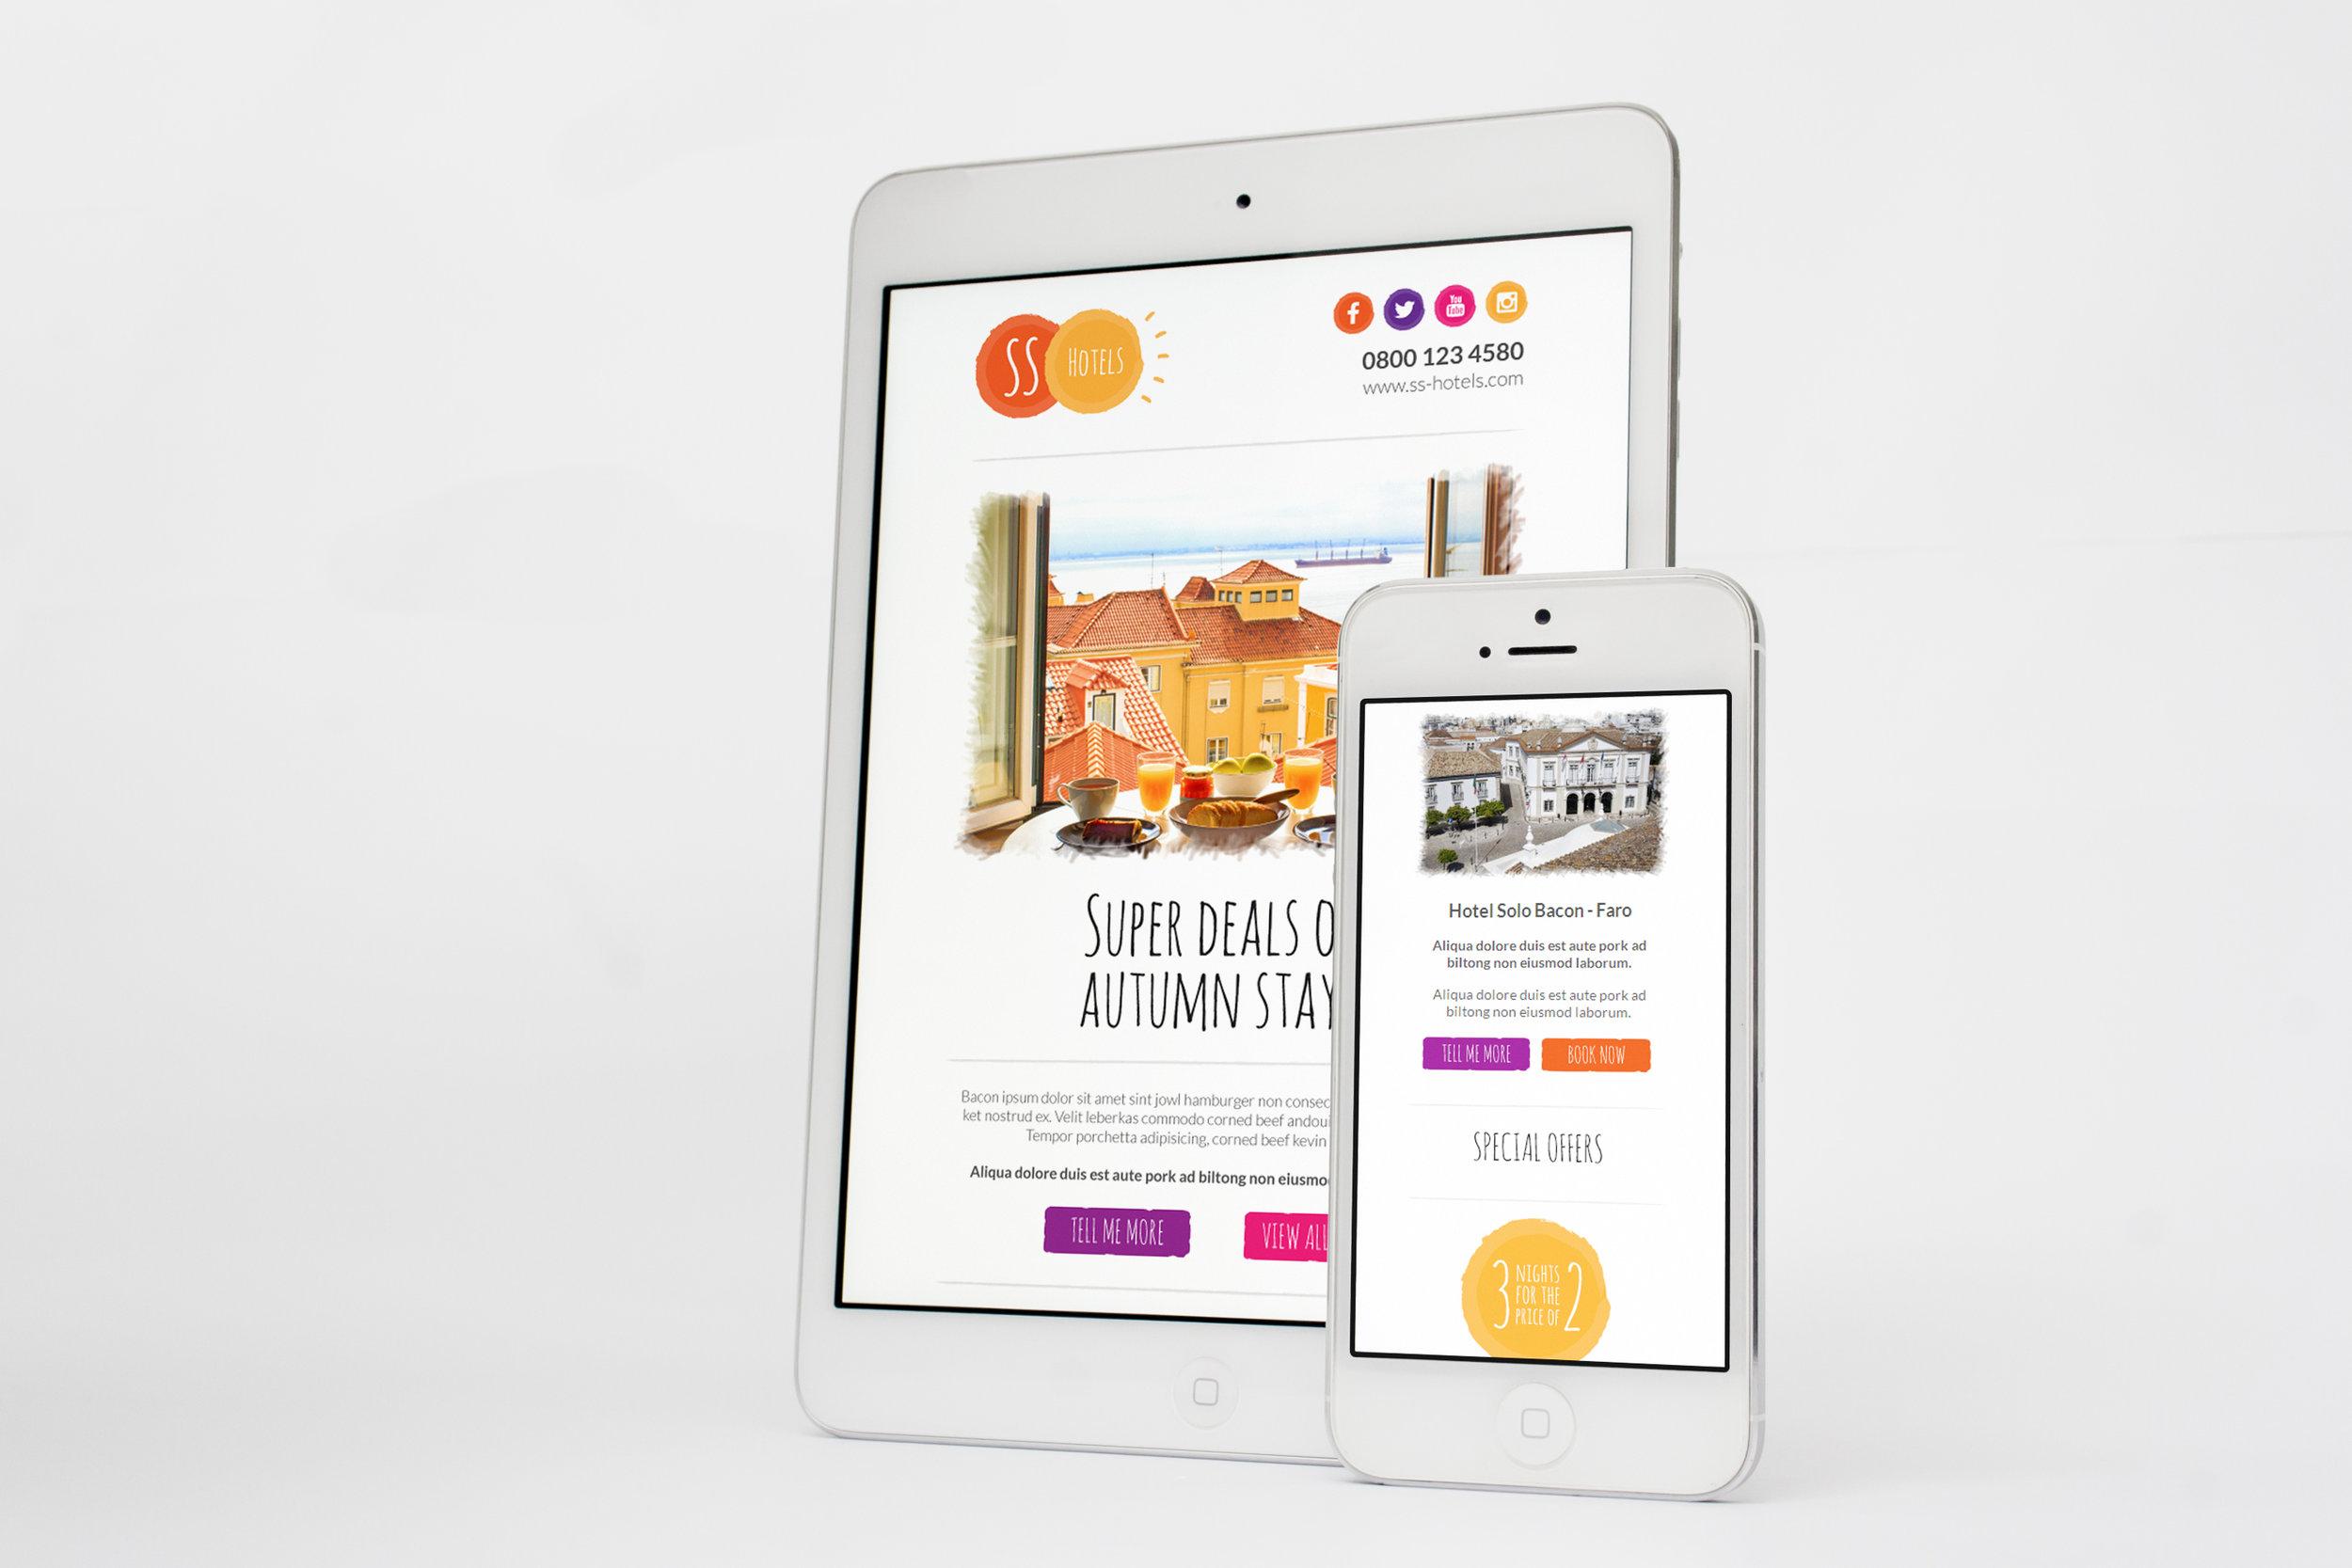 SS Hotels Emailer - iPad & iPhone Mockup 2.jpg